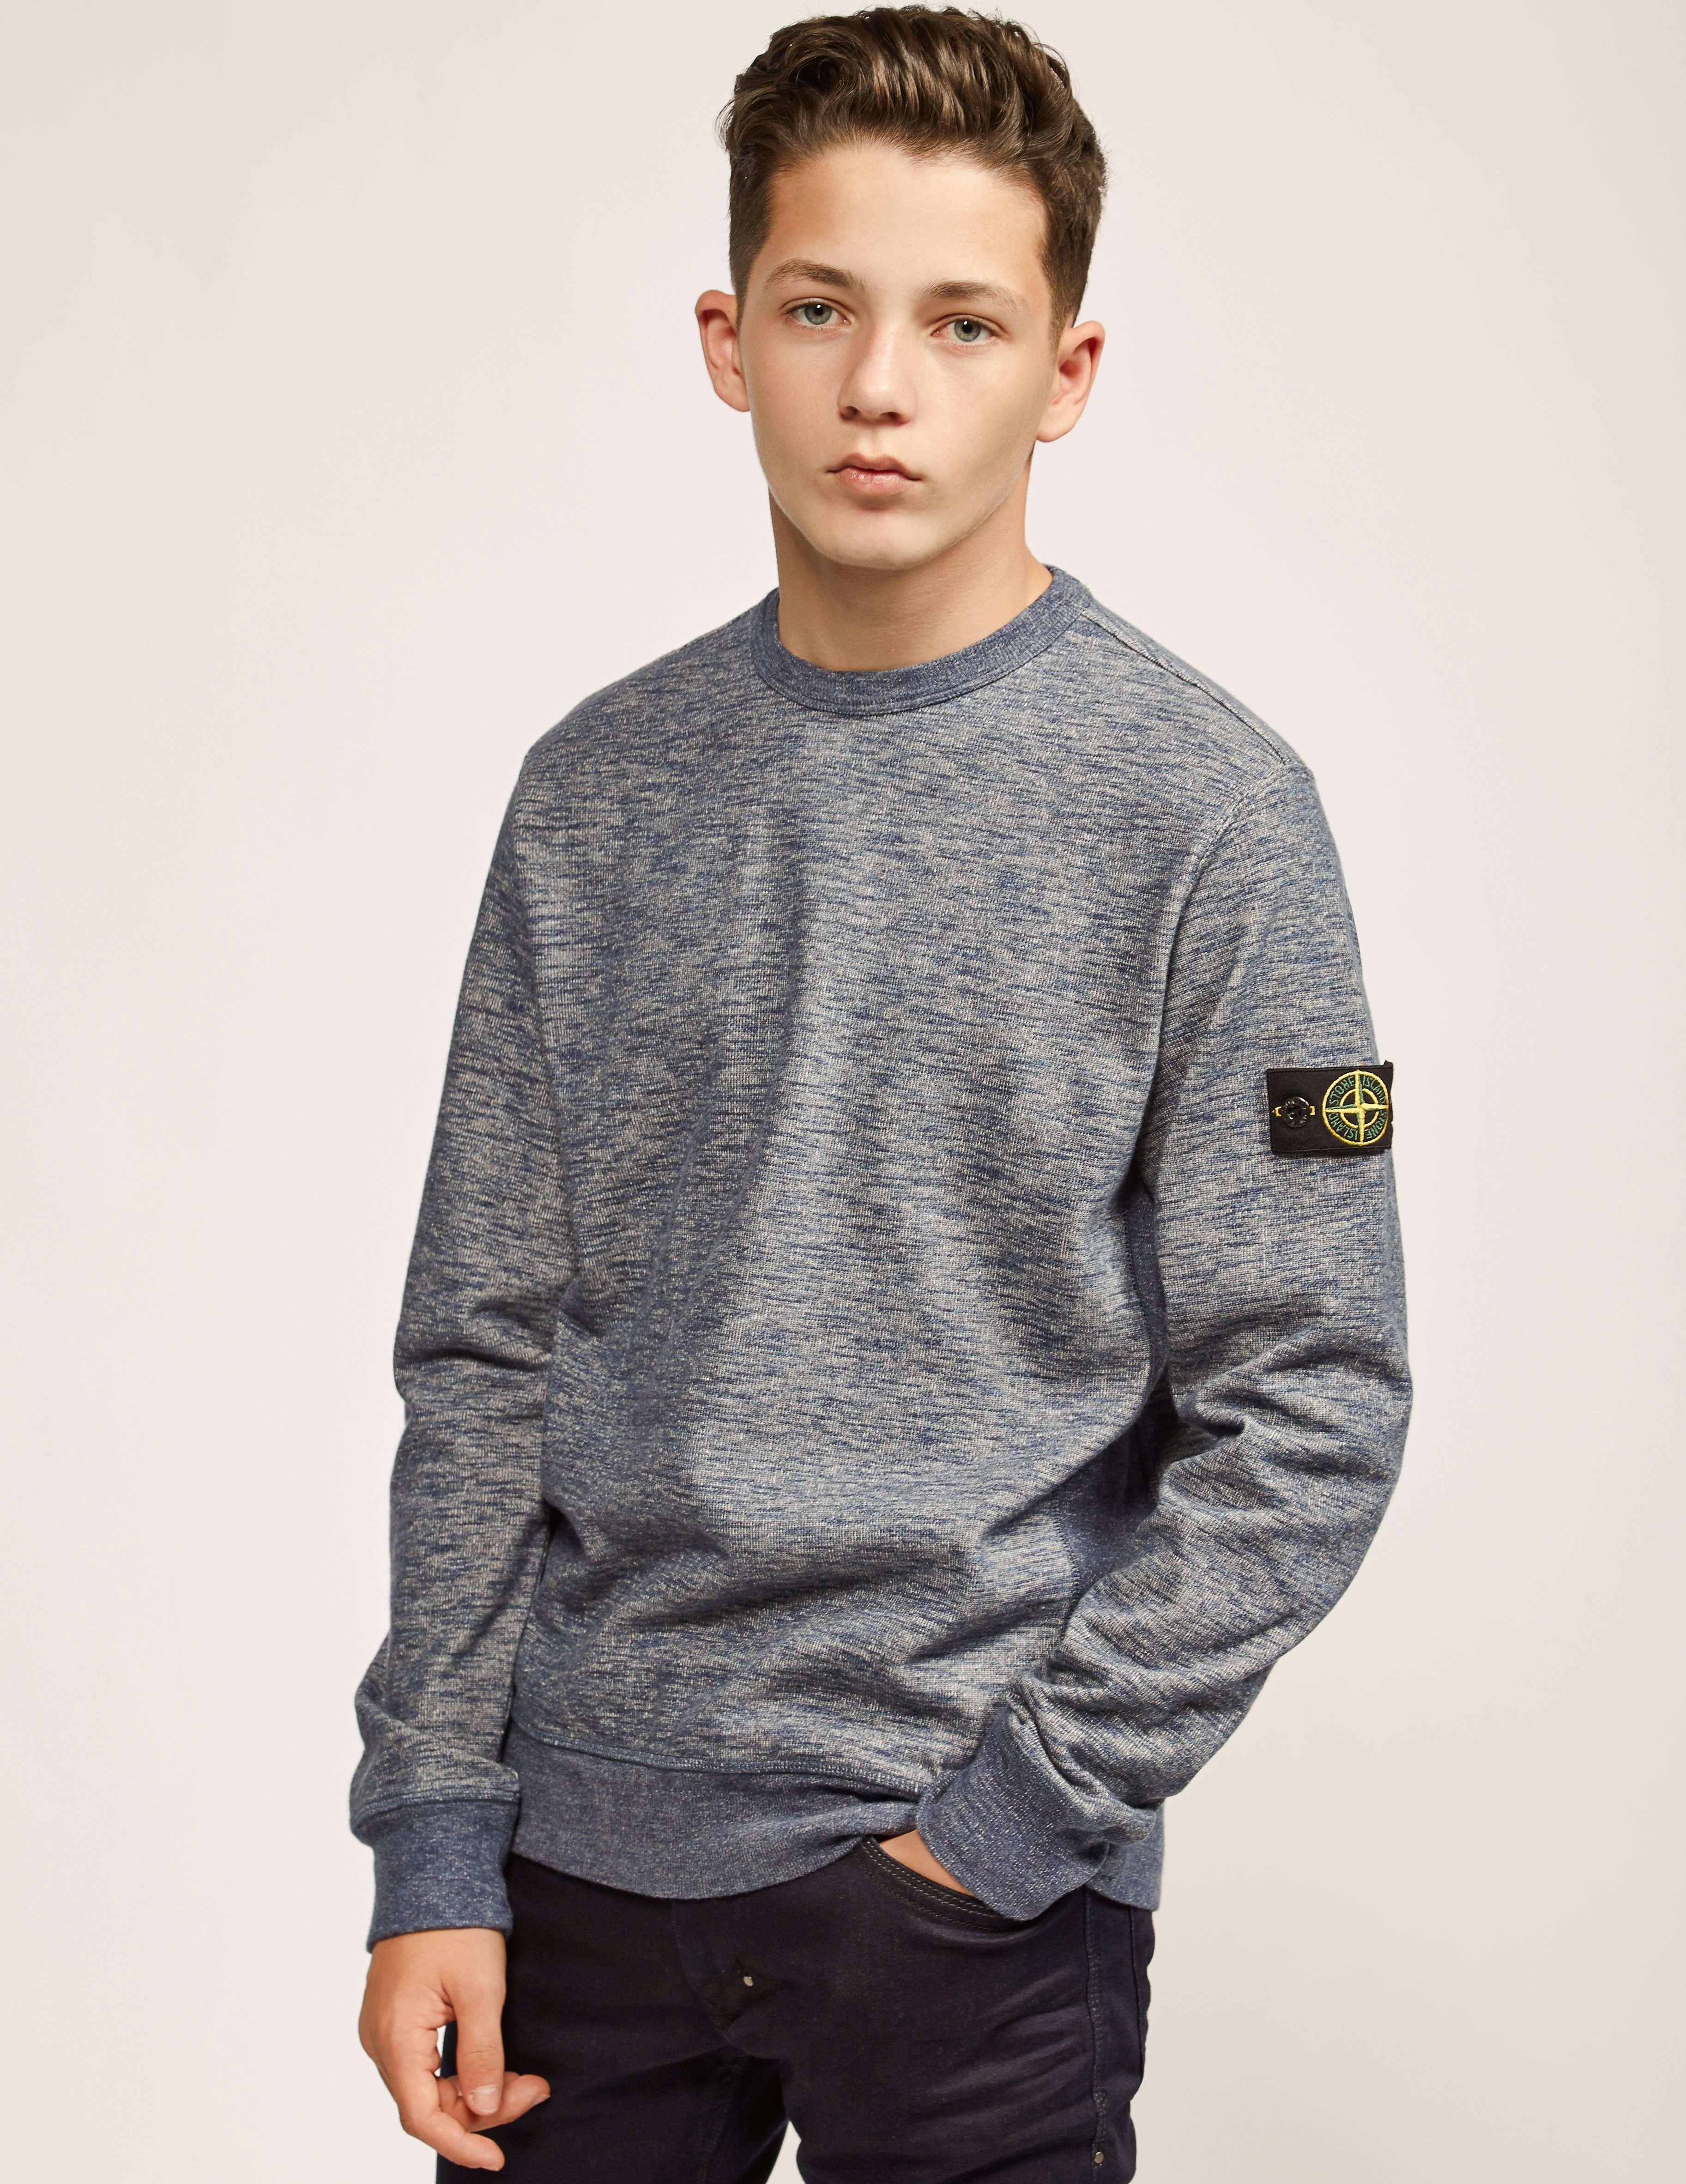 Mens Sweater Shirts